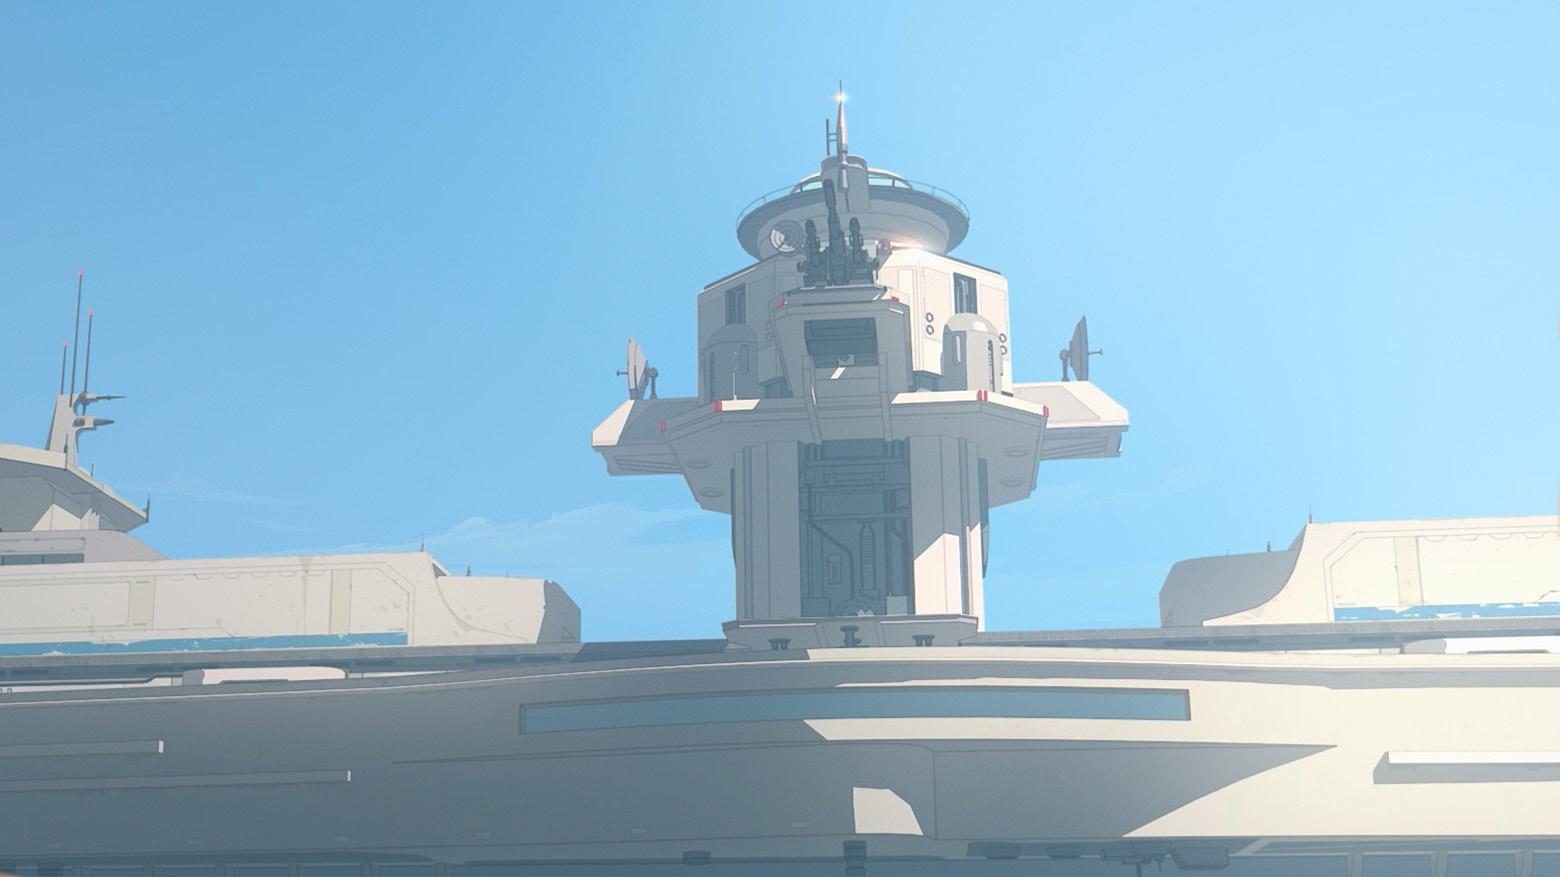 Doza Tower